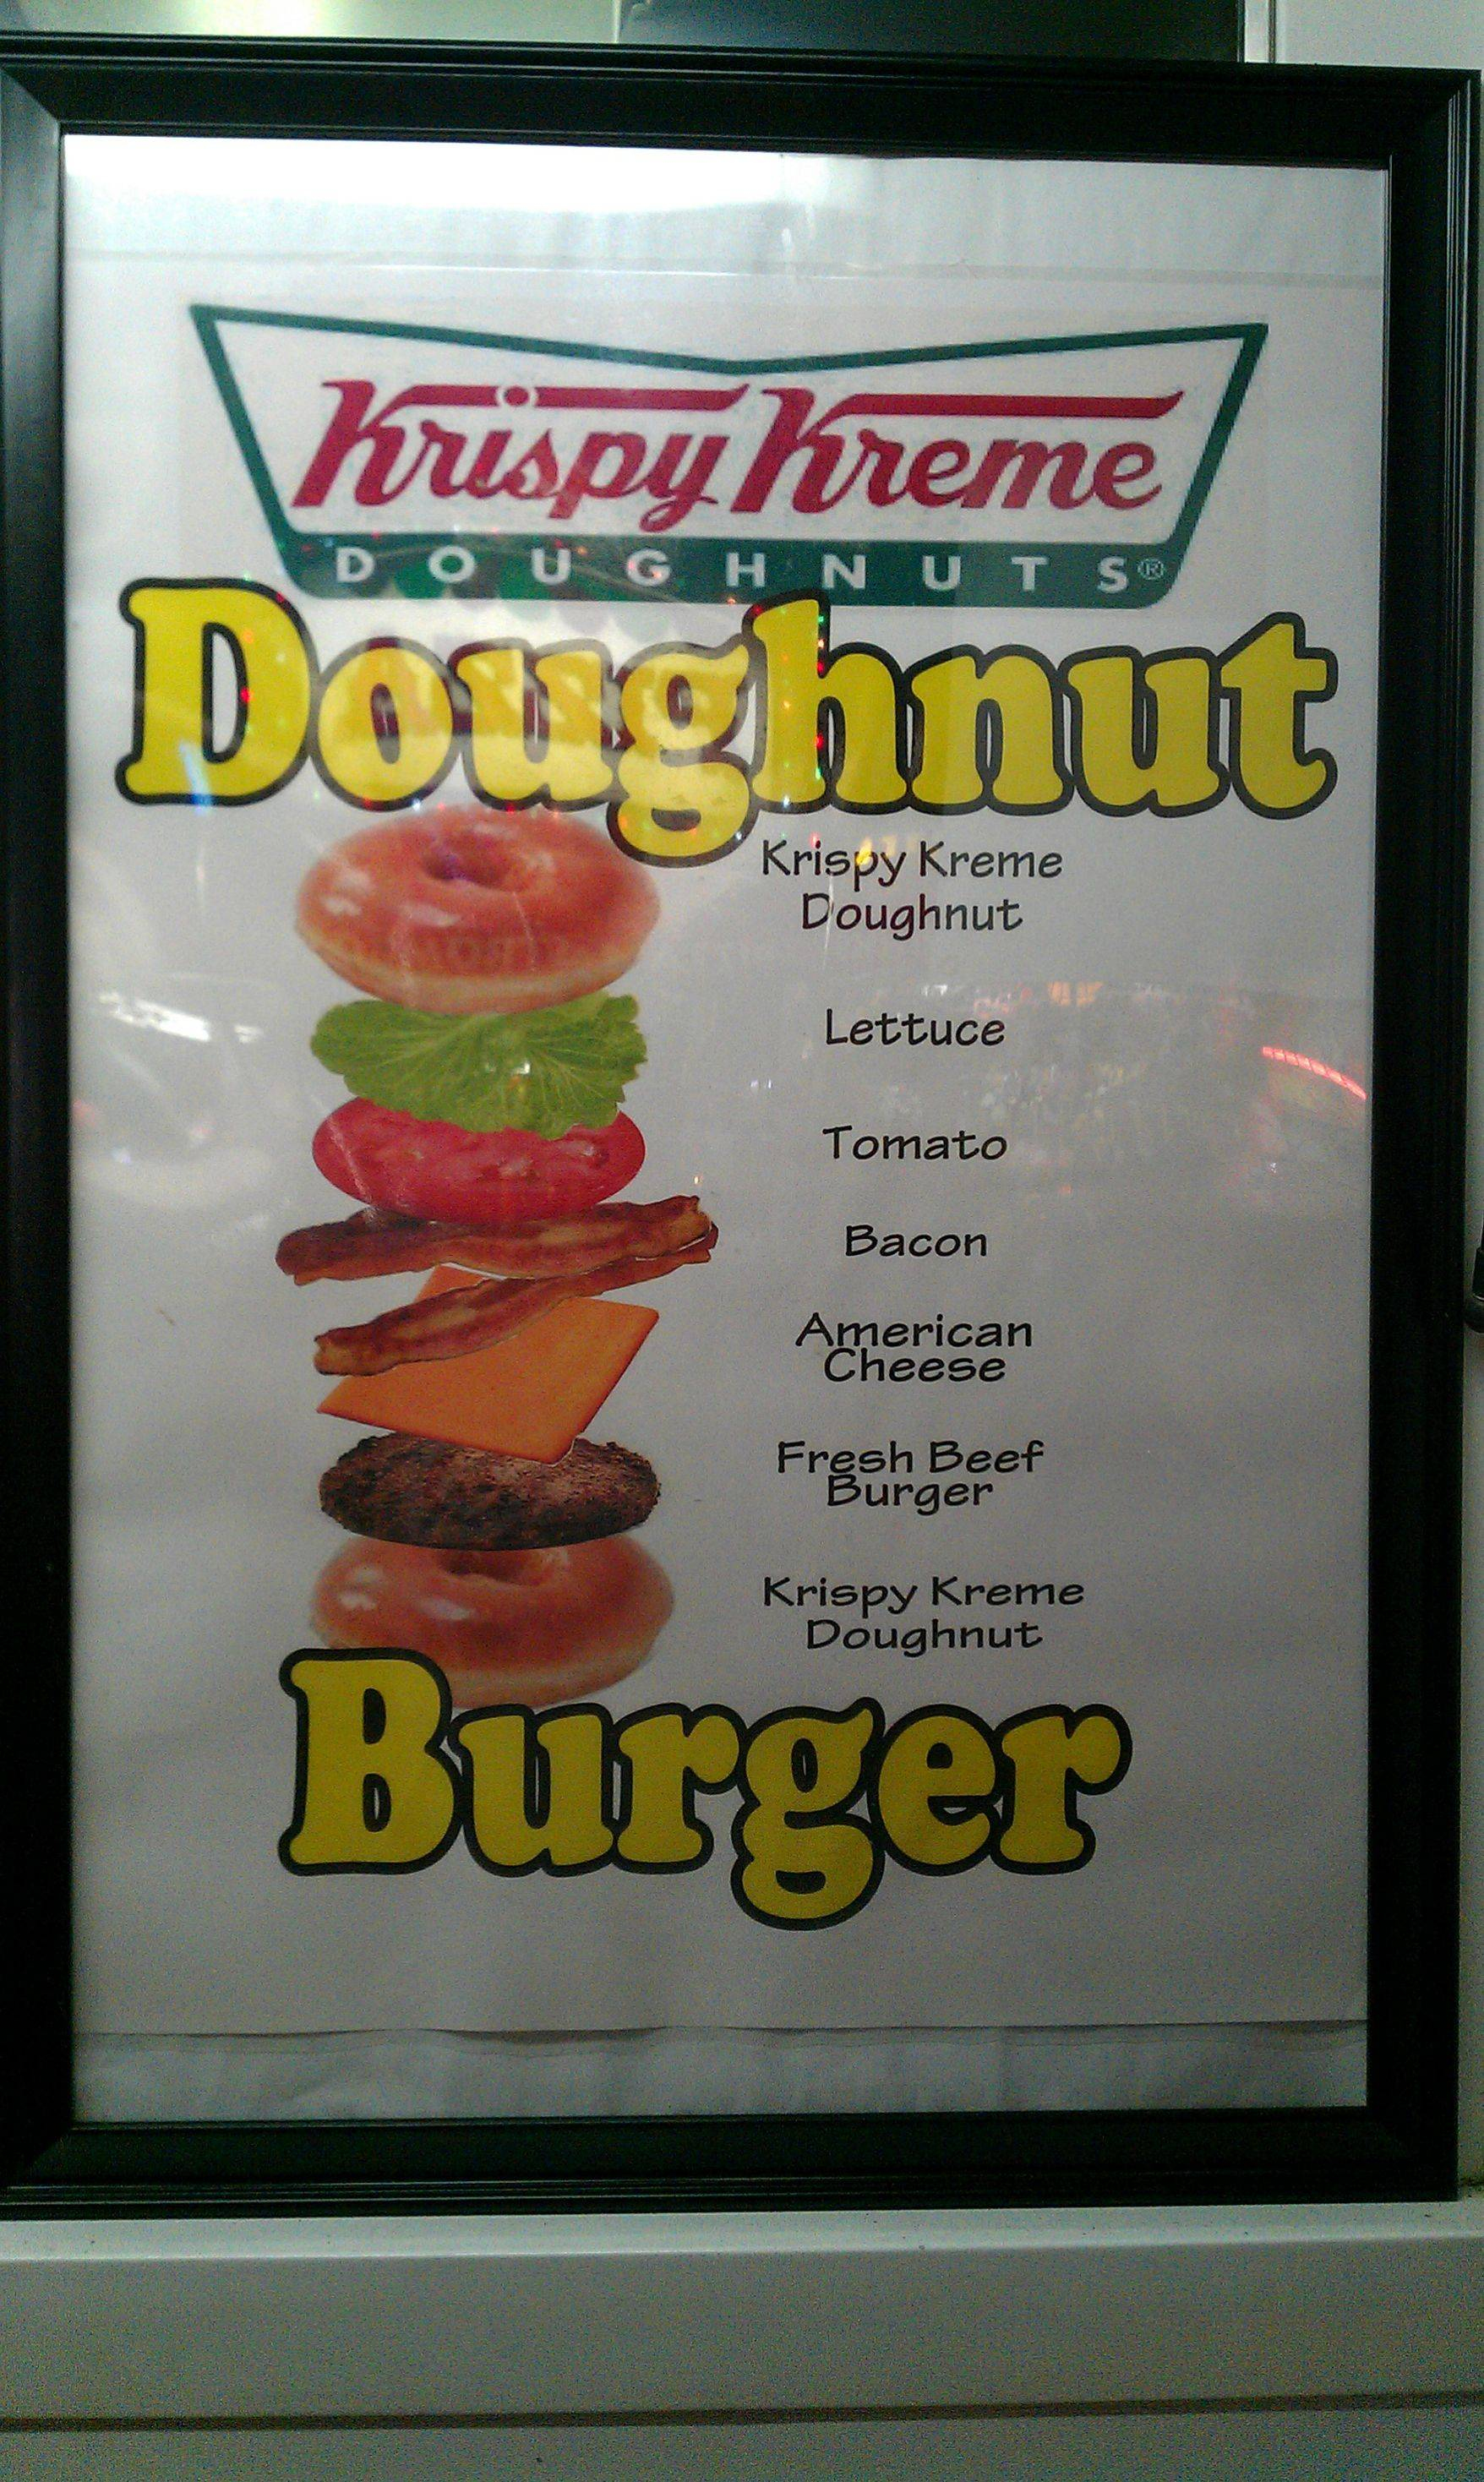 doughnut-burger